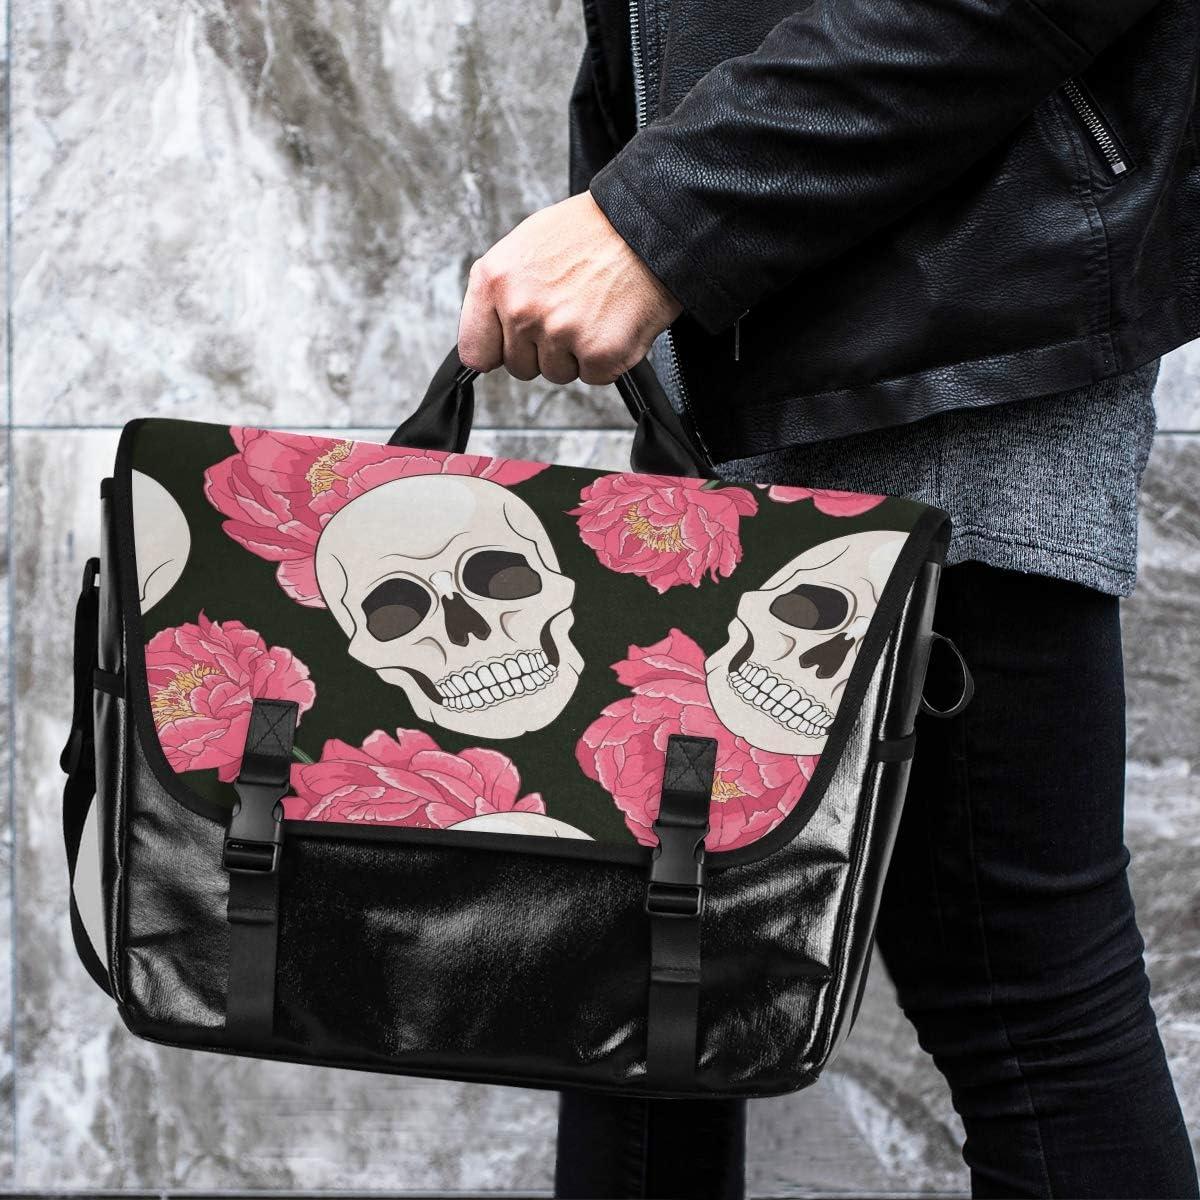 Casual Canvas Satchel Traveling Camping Flower for Men Women Student Laptop Computer Messenger Bag Shoulder Bag Gothic Skull Pink Peonies Flower